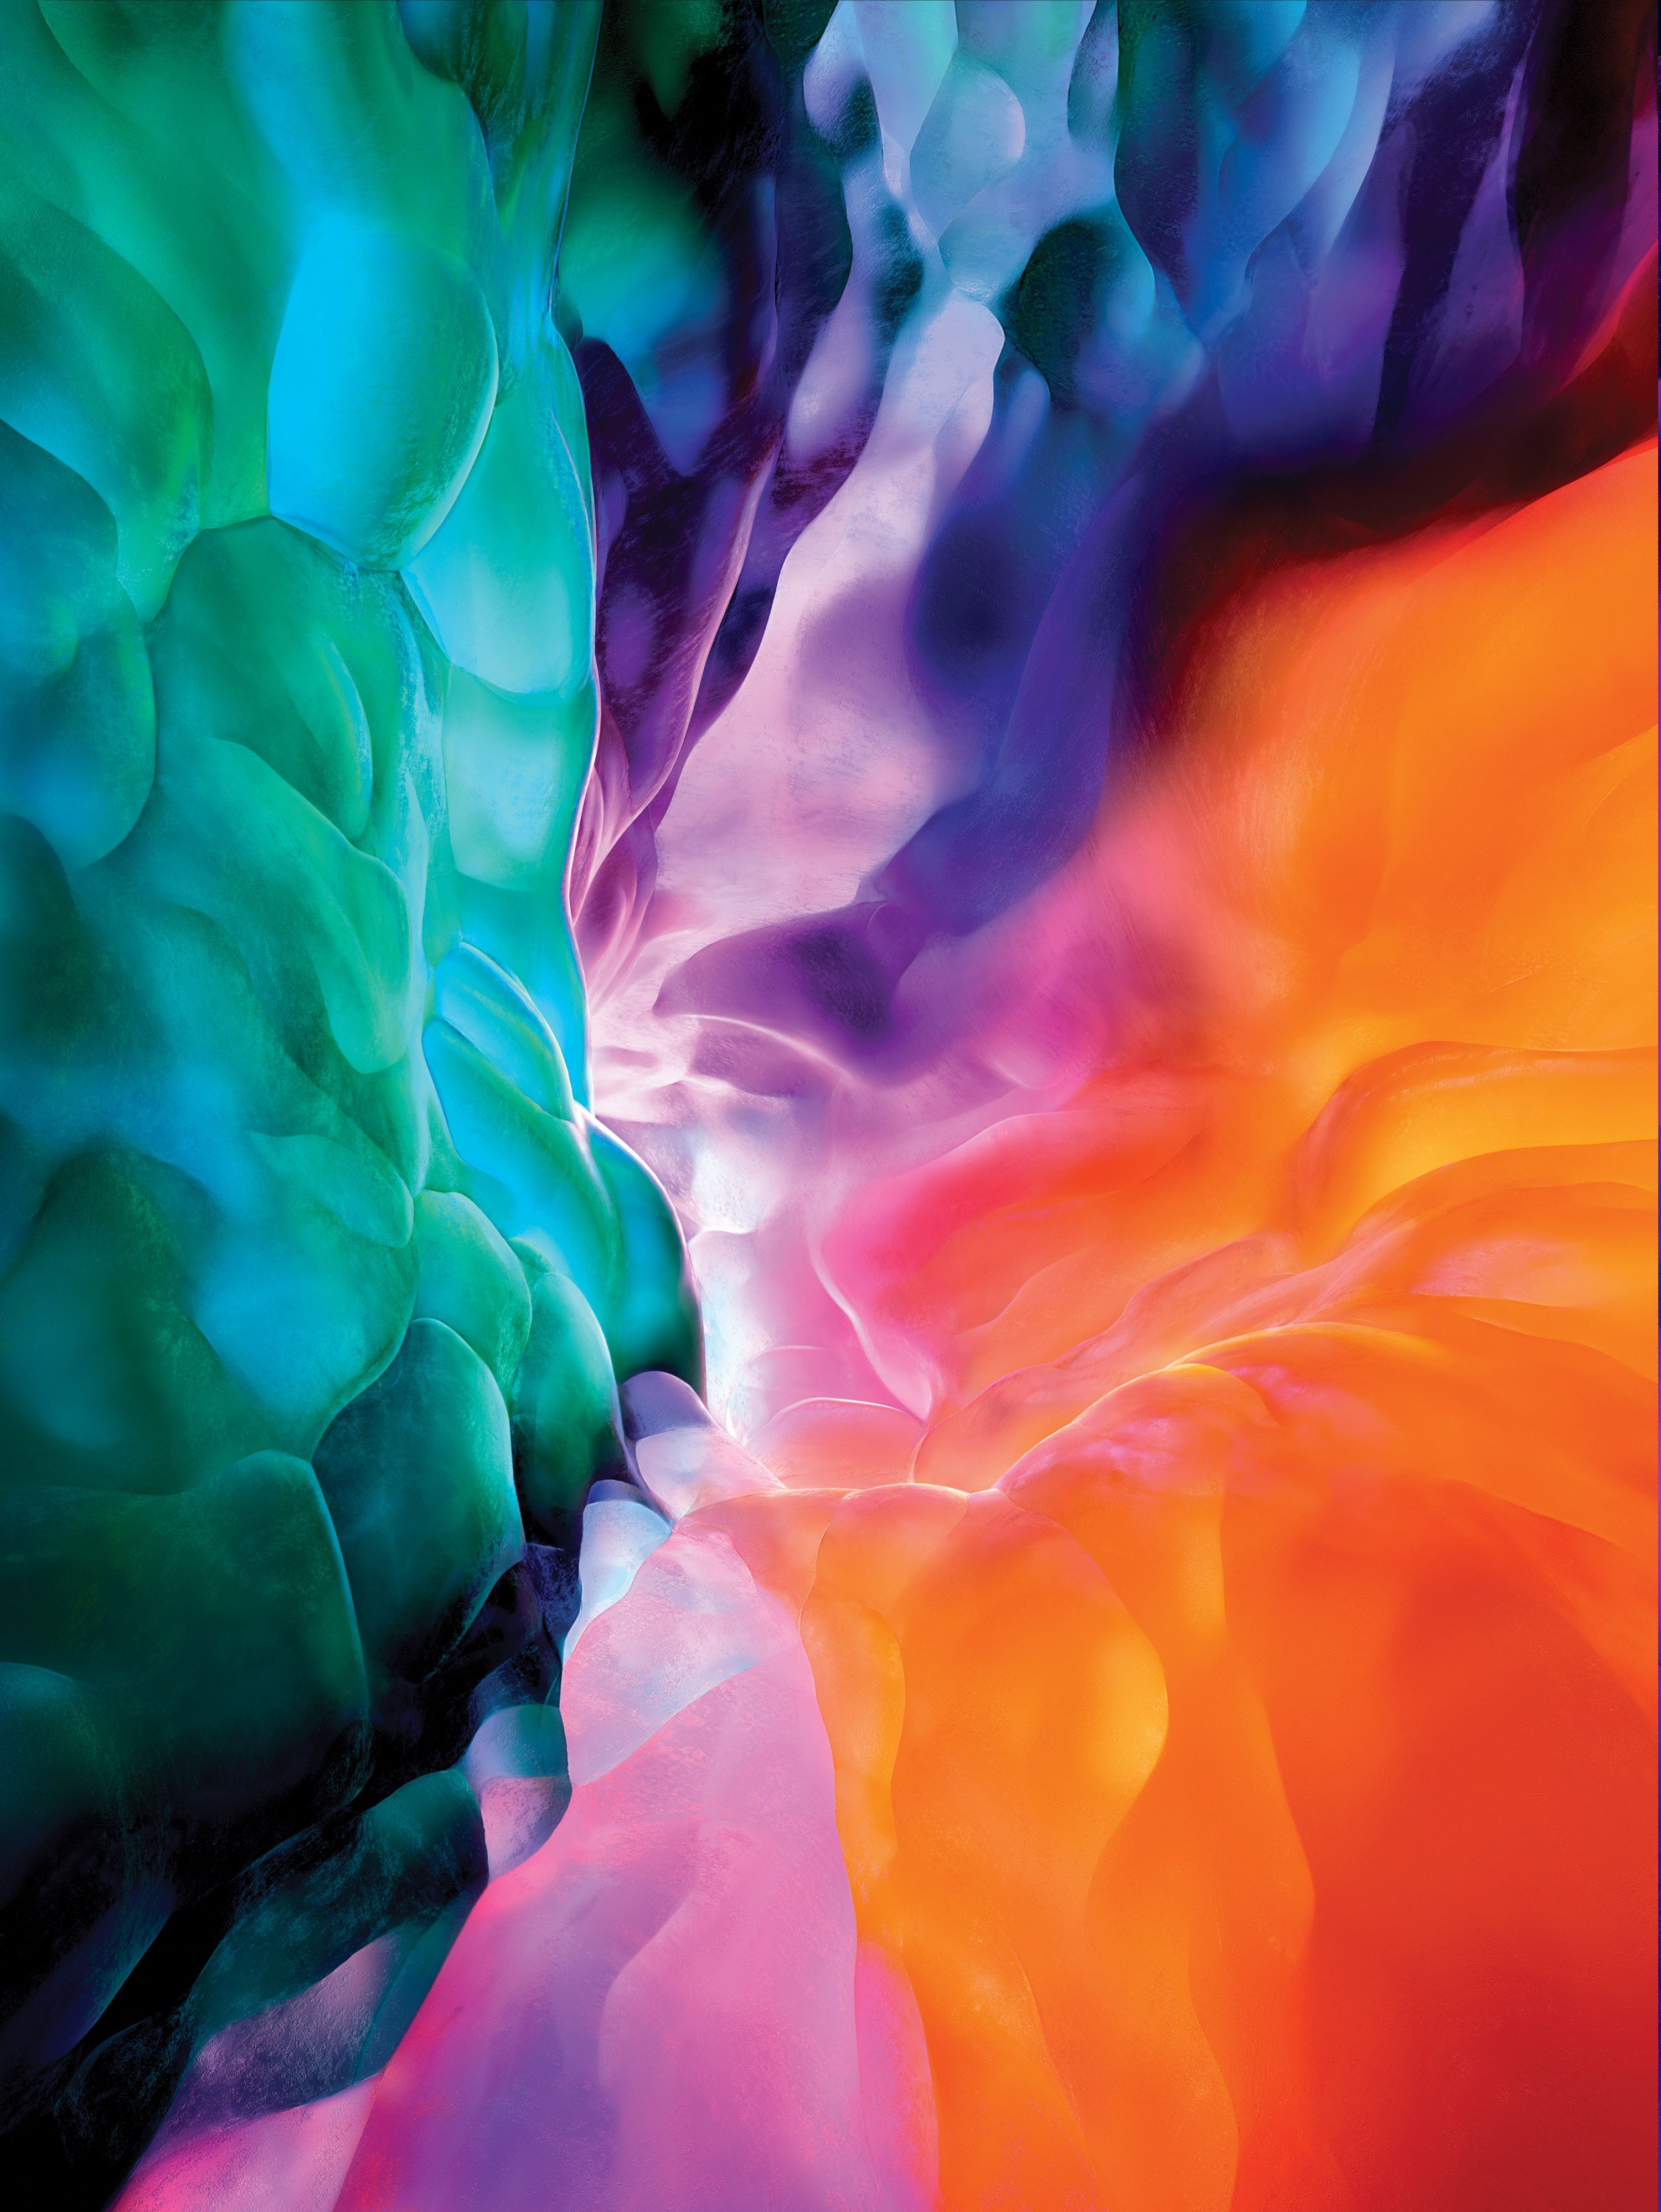 iPad Pro 2020 Wallpapers - Top Free iPad Pro 2020 ...